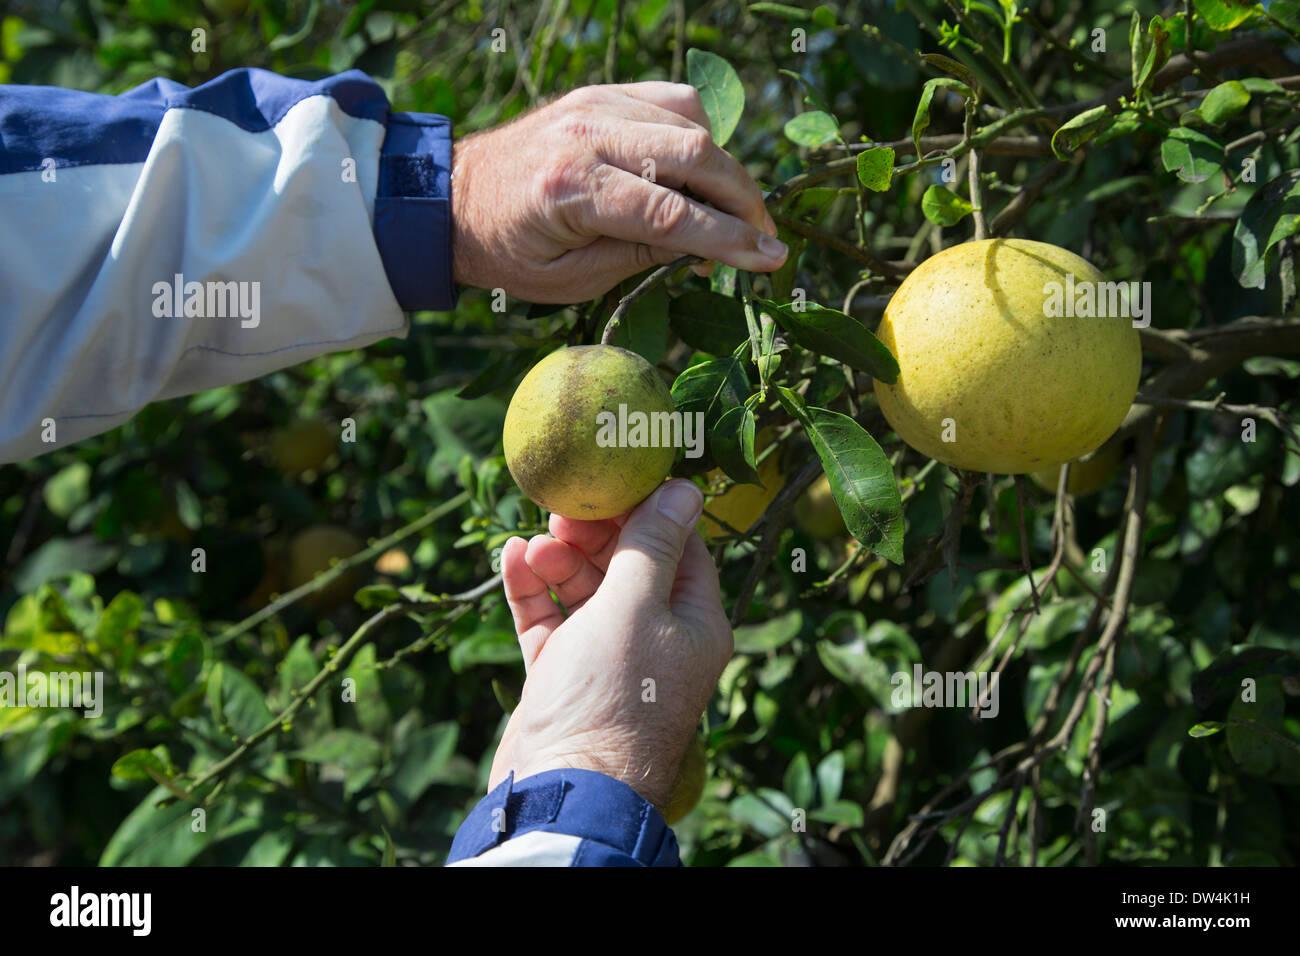 Citrus Greening Krankheit betrifft einen Grapefruit-Baum im Indian River Citrus Stadtteil an der Ostküste Floridas. Stockbild